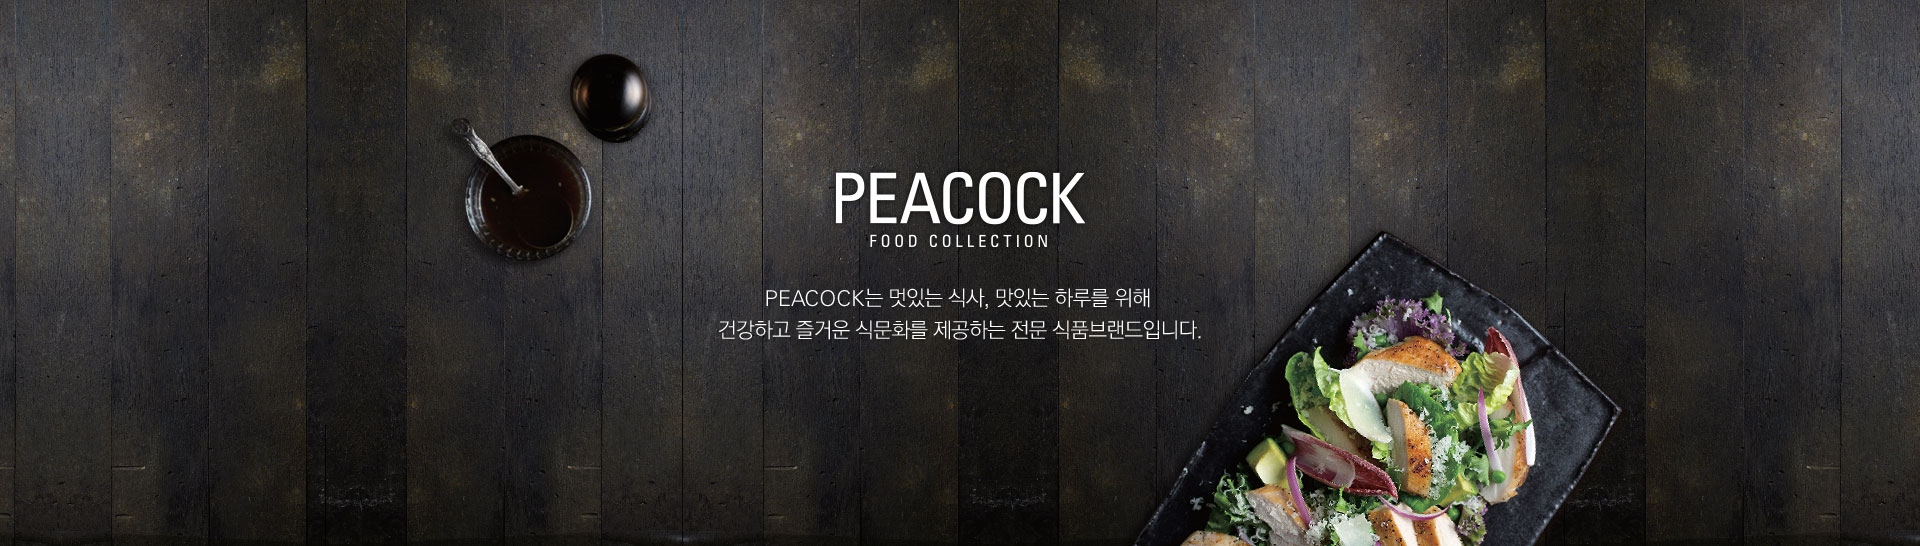 PEACOCK FOOD COLLECTION - PEACOCK는 멋있는 식사, 맛있는 하루를 위해 건강하고 즐거운 식문화를 제공하는 전문 식품 브랜드입니다.